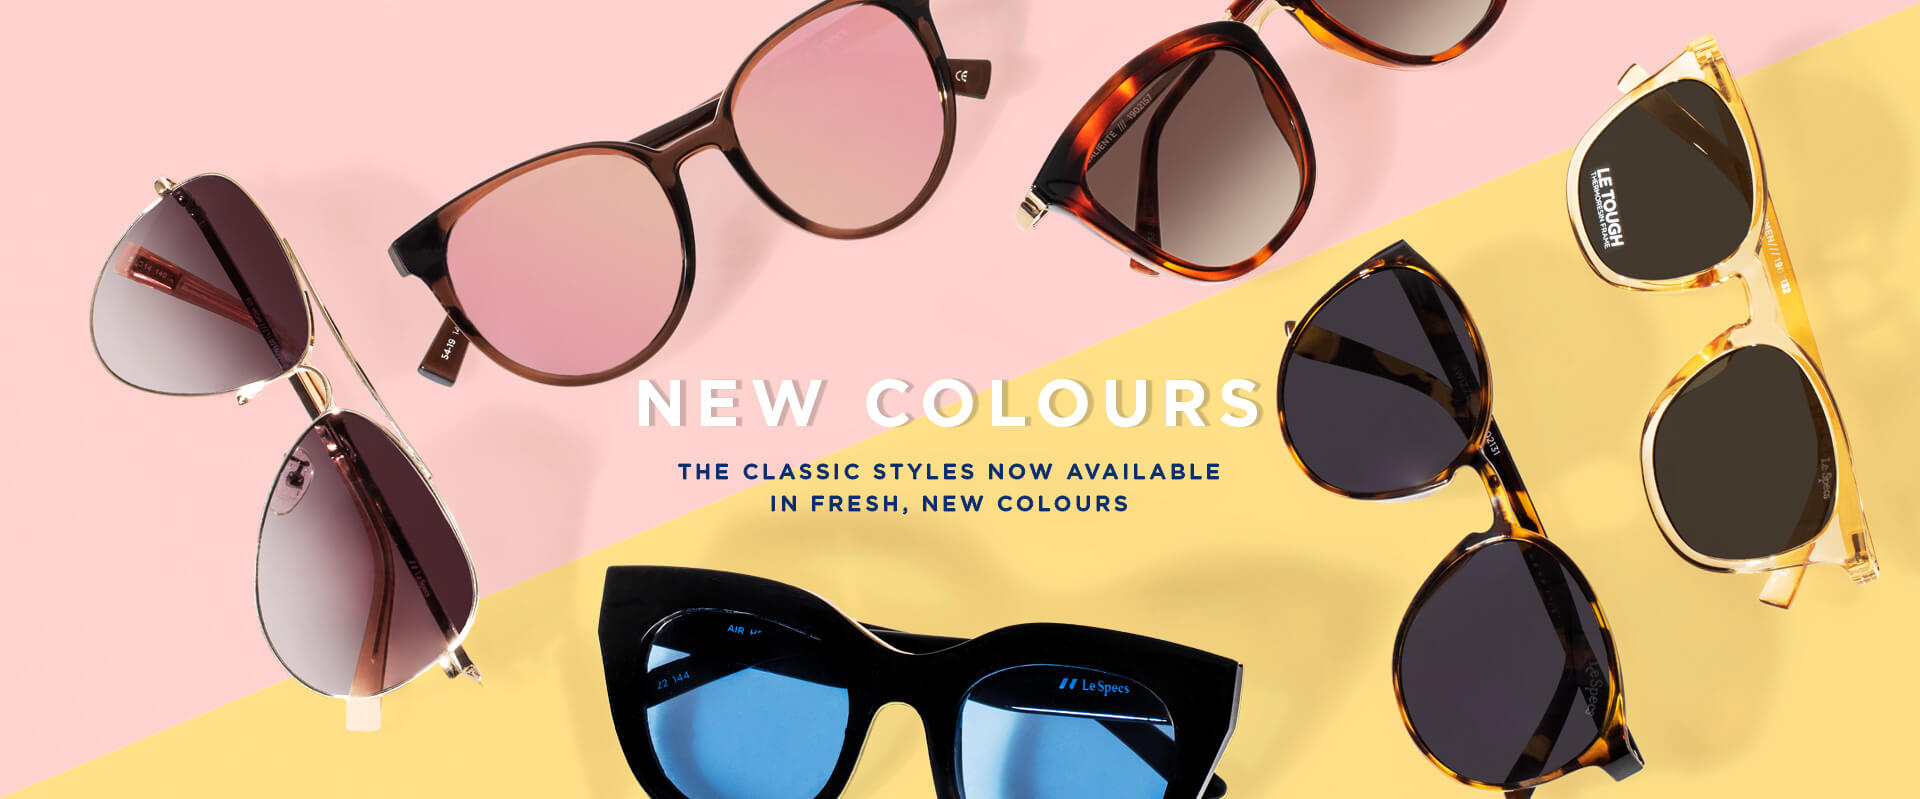 Same favourites, new colours